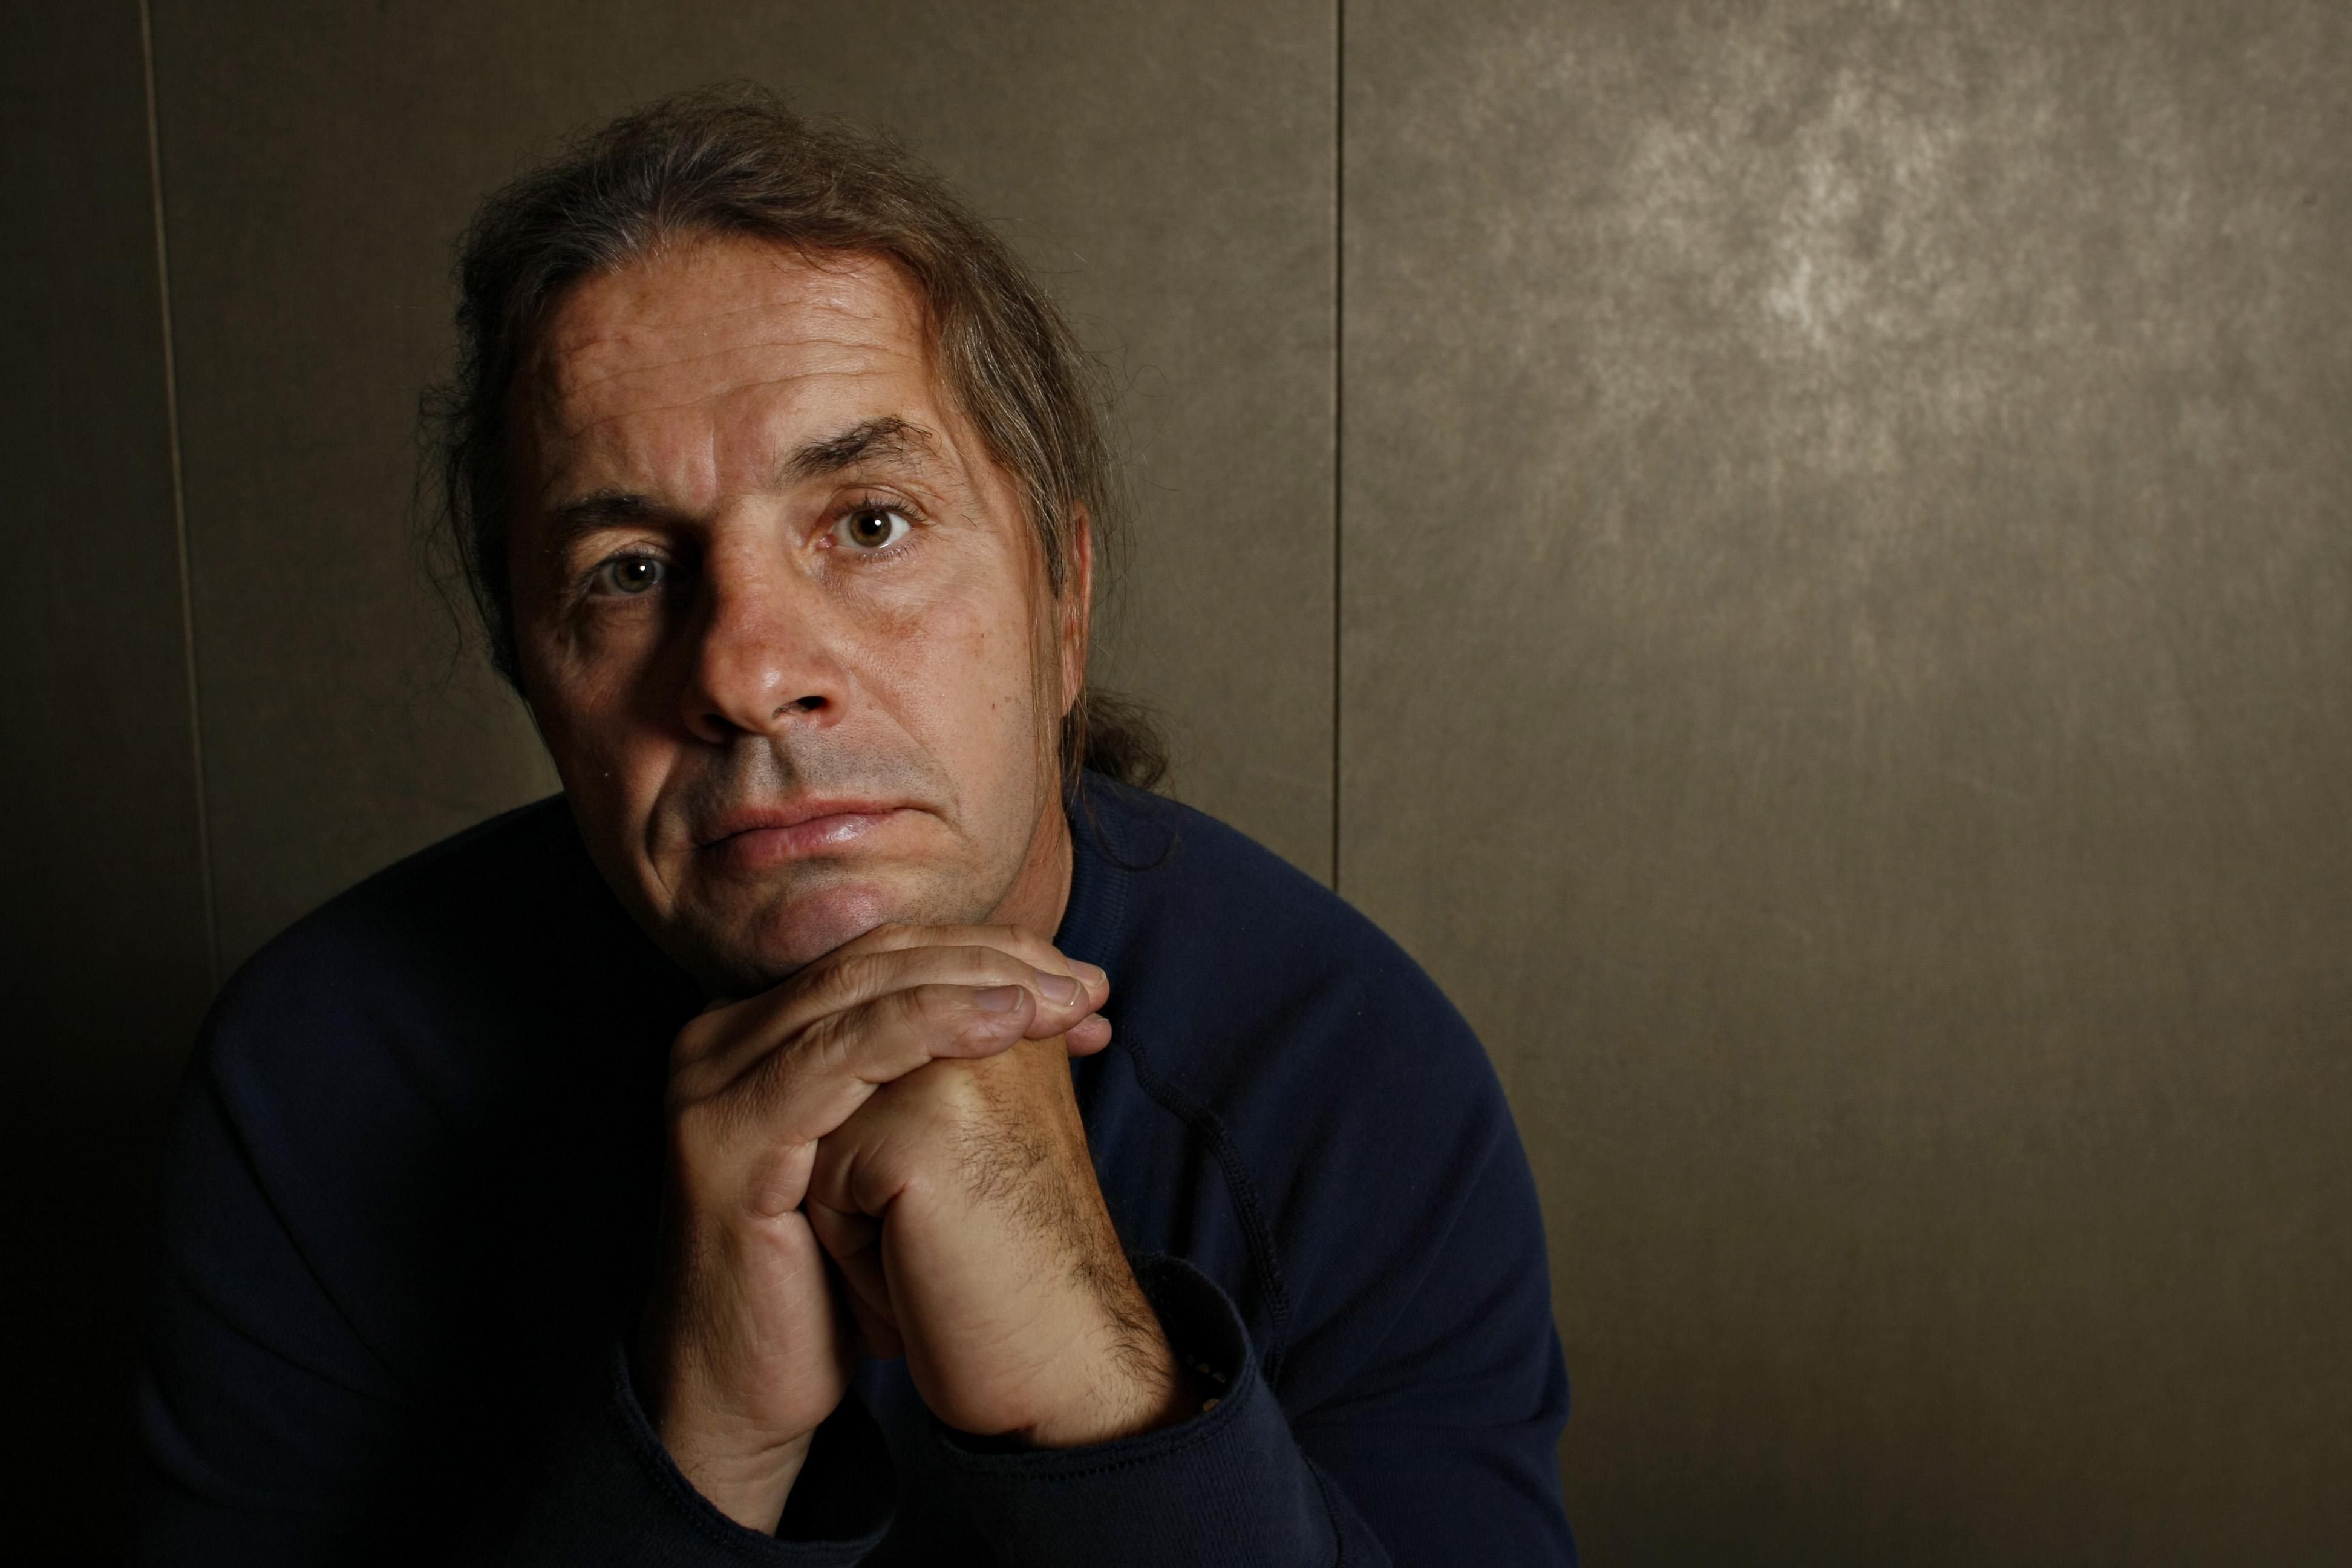 Bret Hart photographed at Random House Publishing, October 23, 2007.